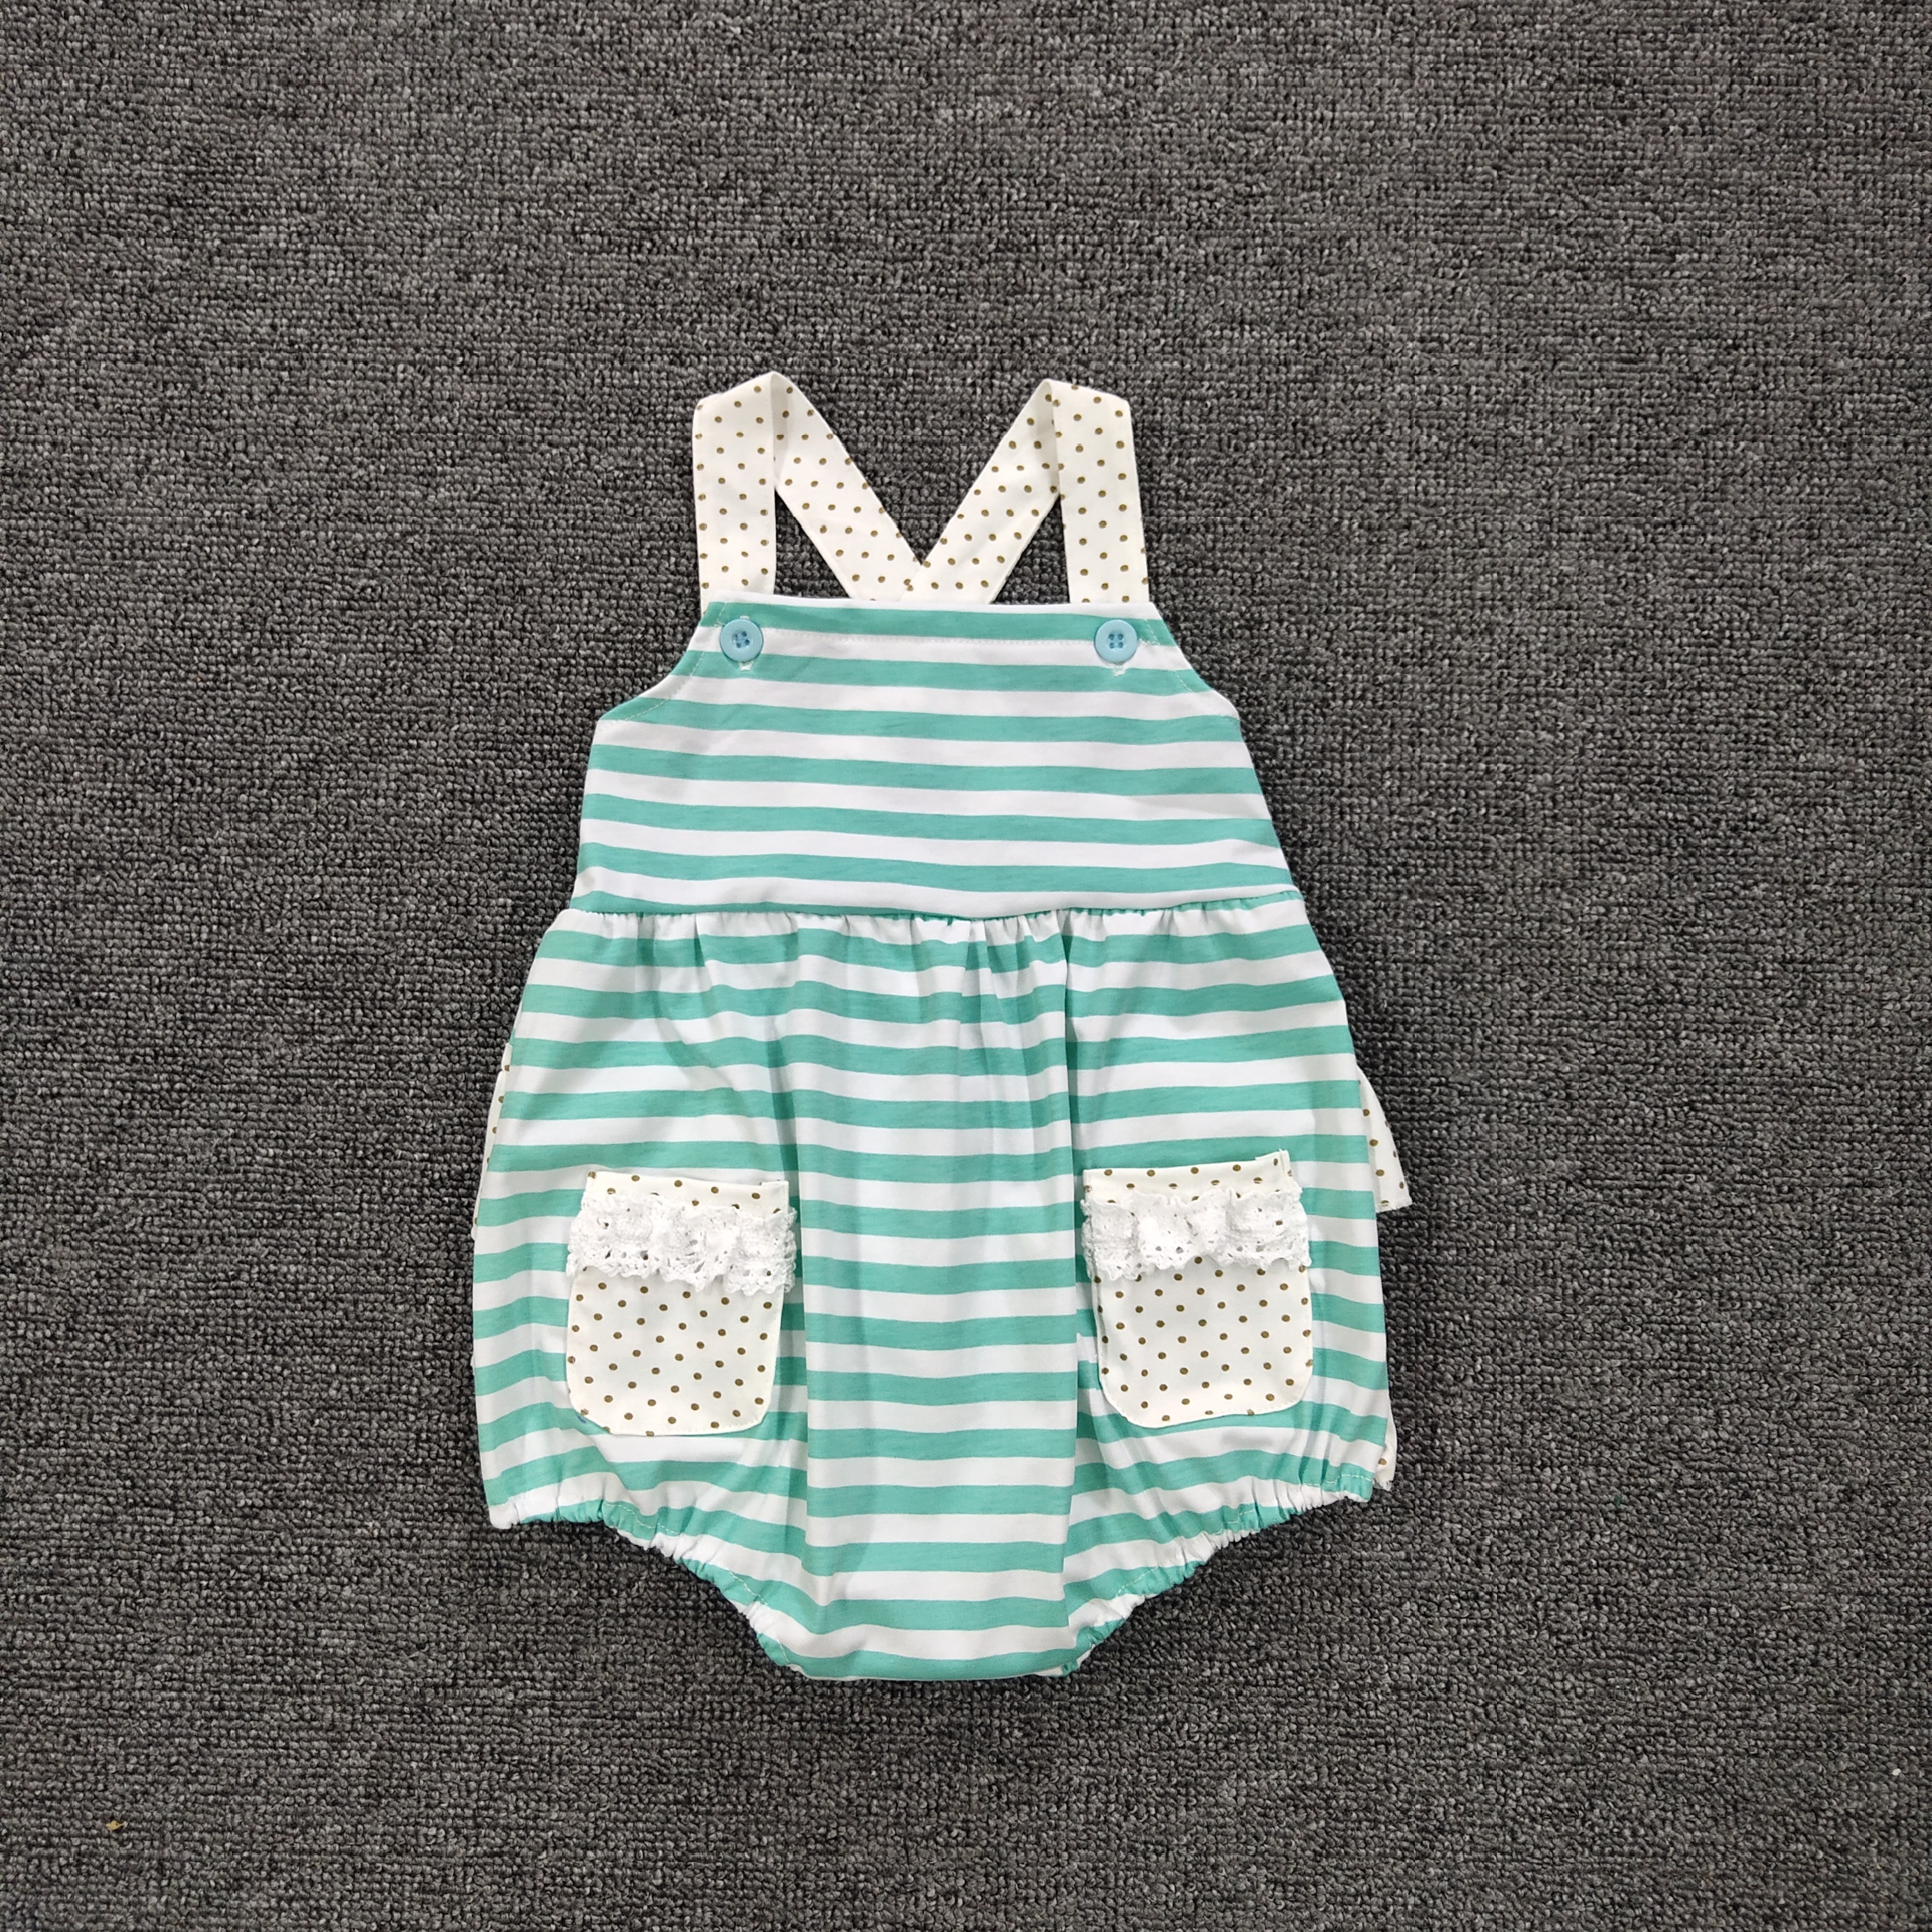 New Romper Girls Romper Summer Bubble Girl Boutique Baby Clothing Mint Green Stripe For Romper